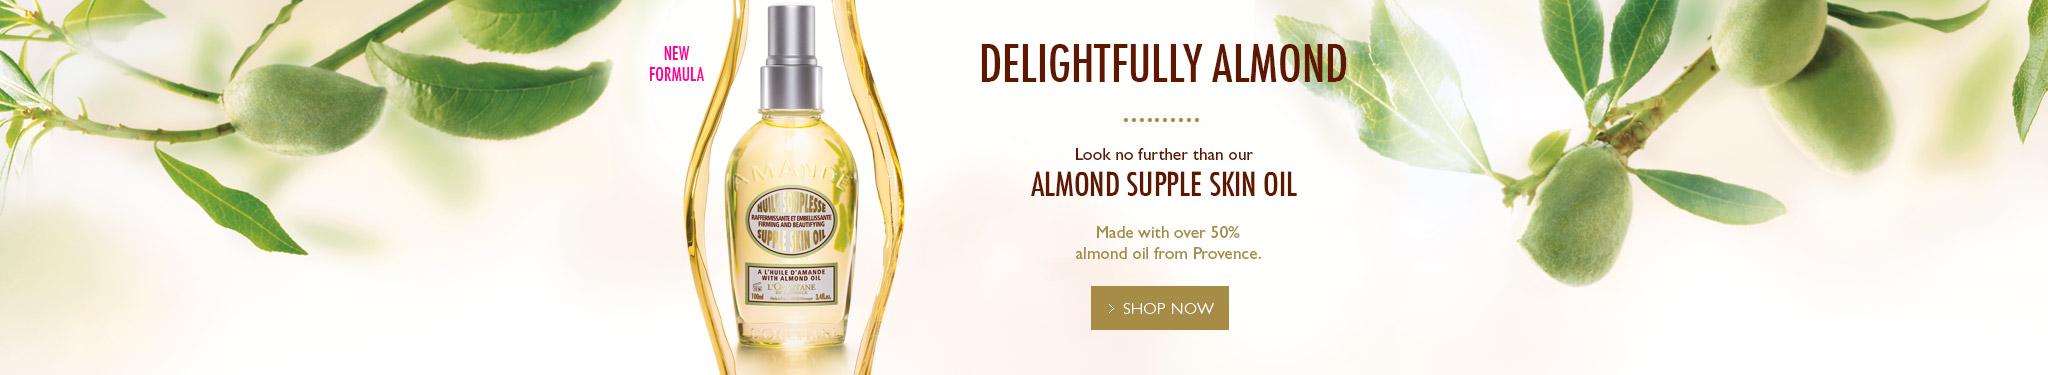 New Formula- supple skin oil